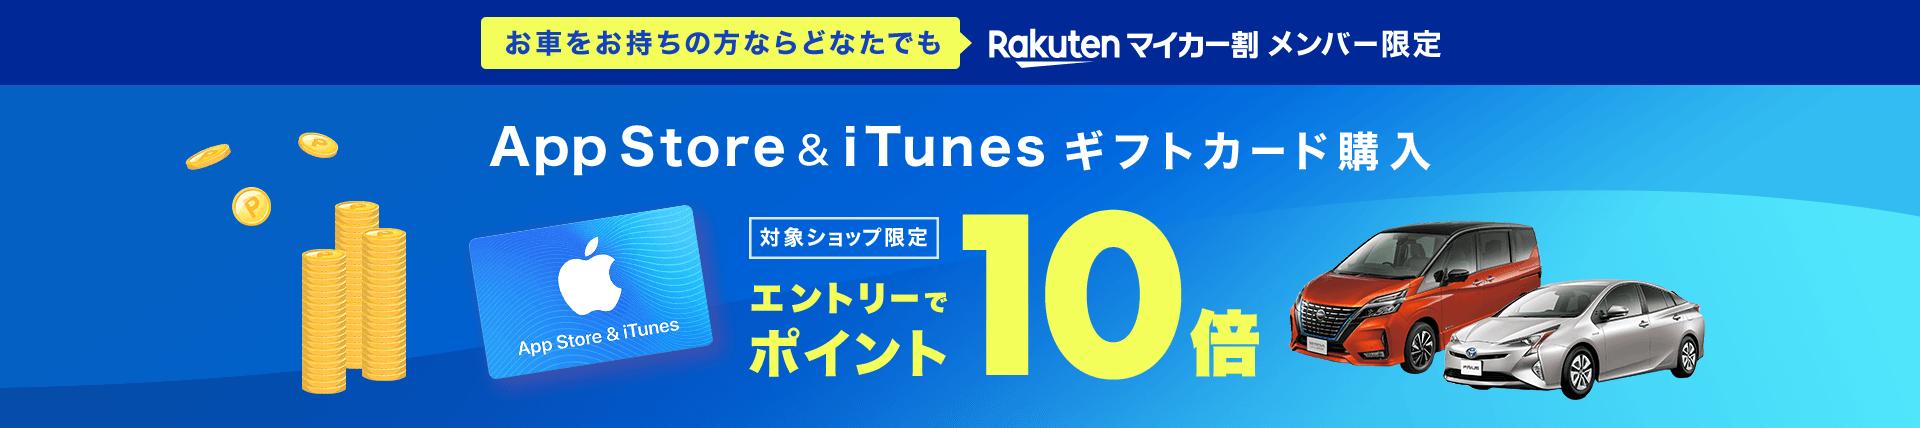 App Store & iTunesギフトカード購入 対象ショップ限定 エントリーでポイント10倍